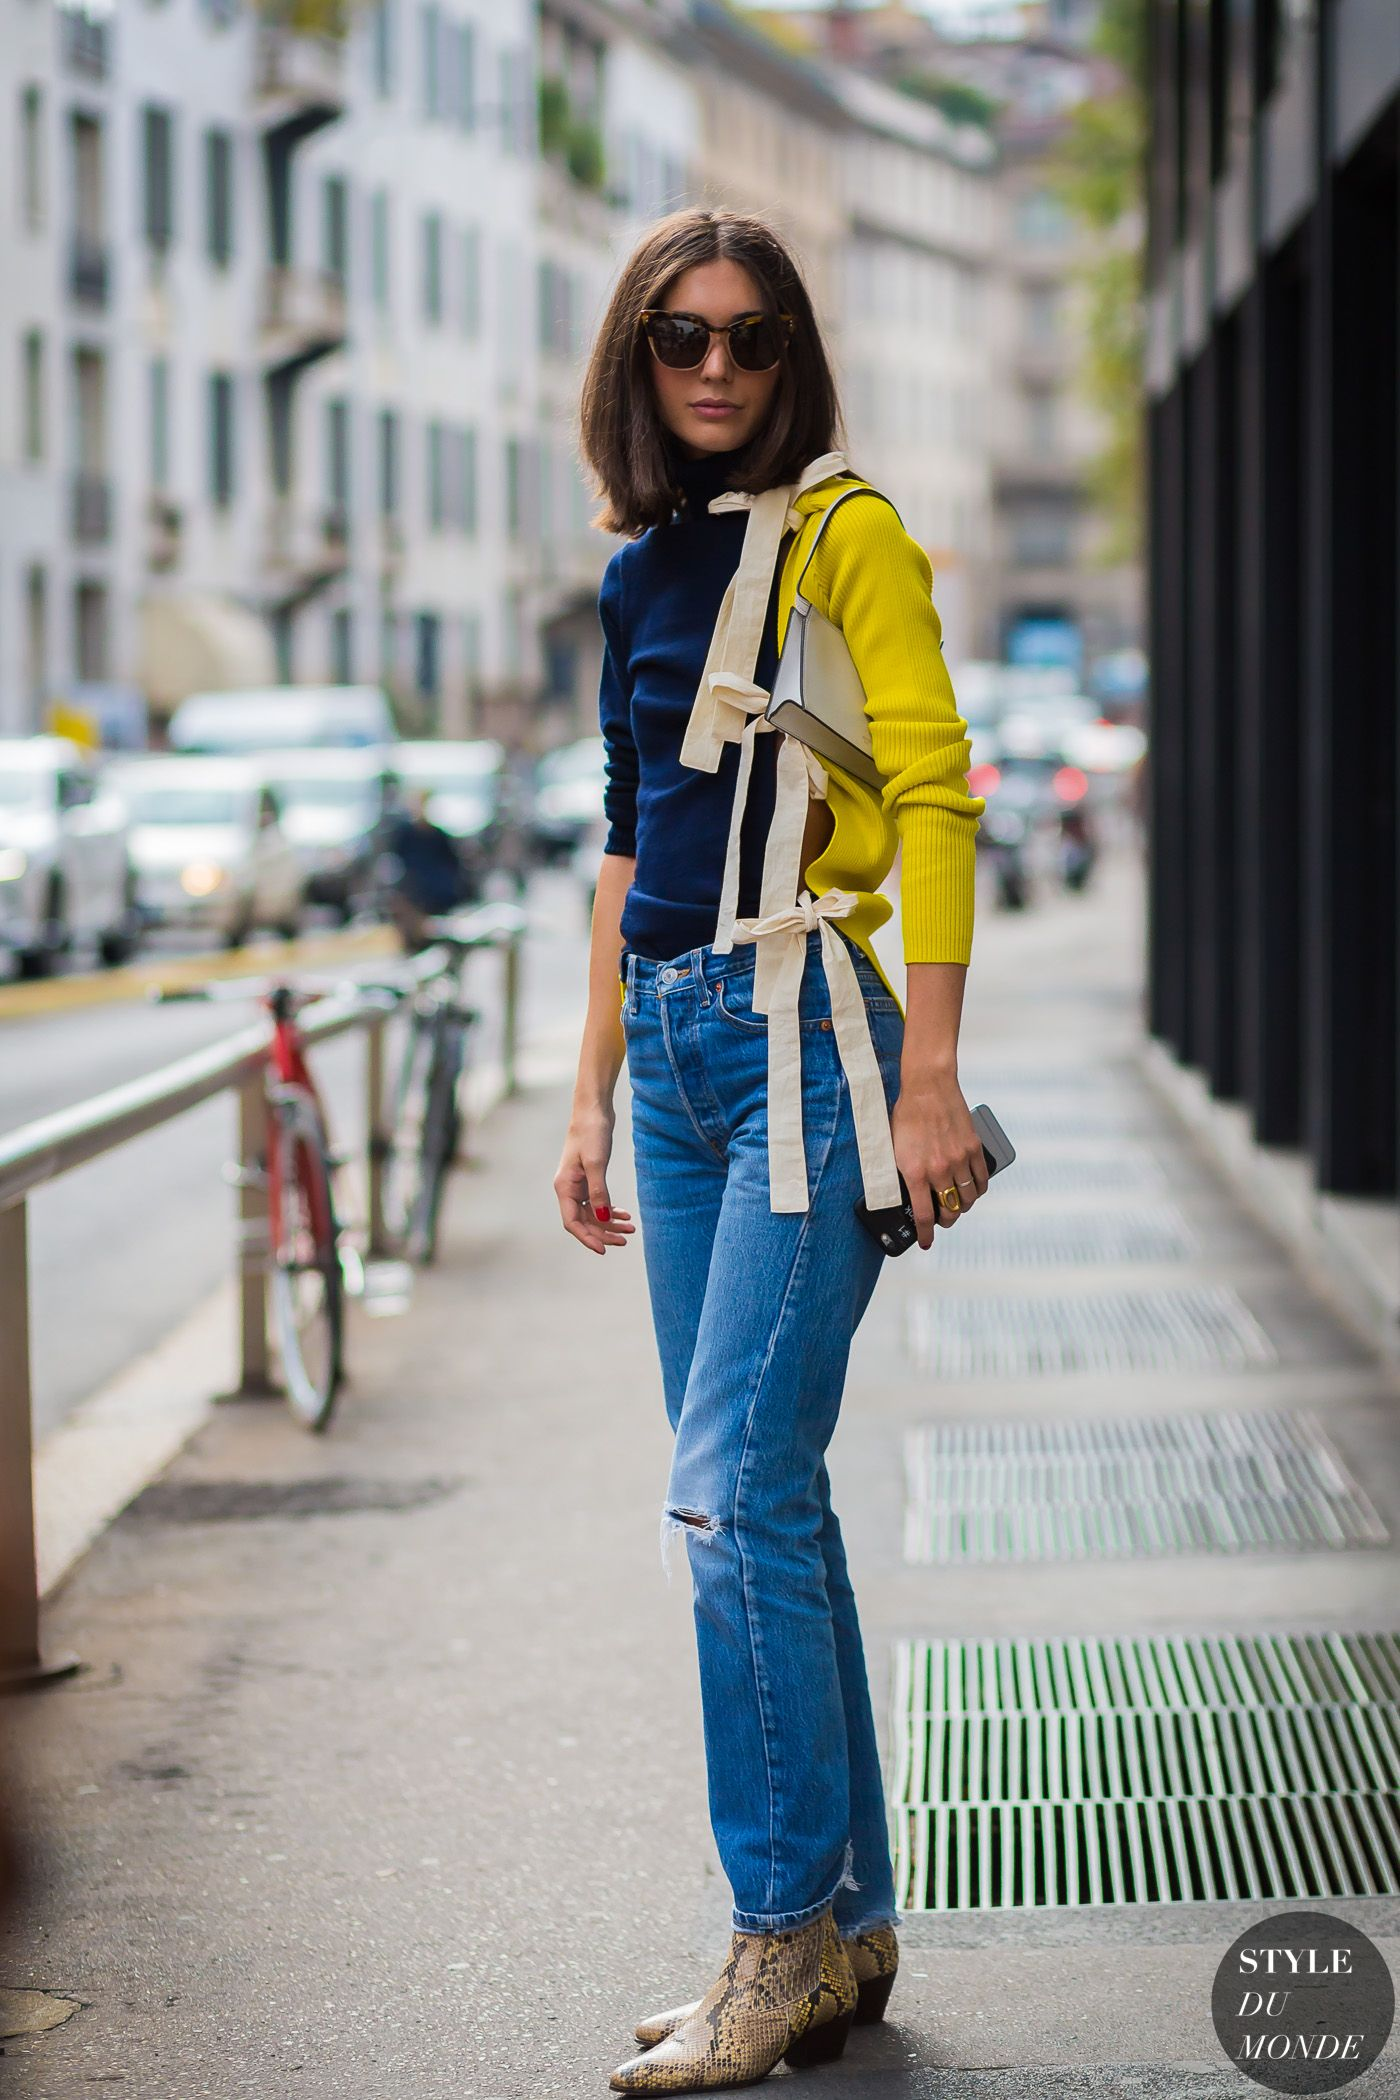 Milan SS 2017 Street Style: Diletta Bonaiuti | s t r e e t ...